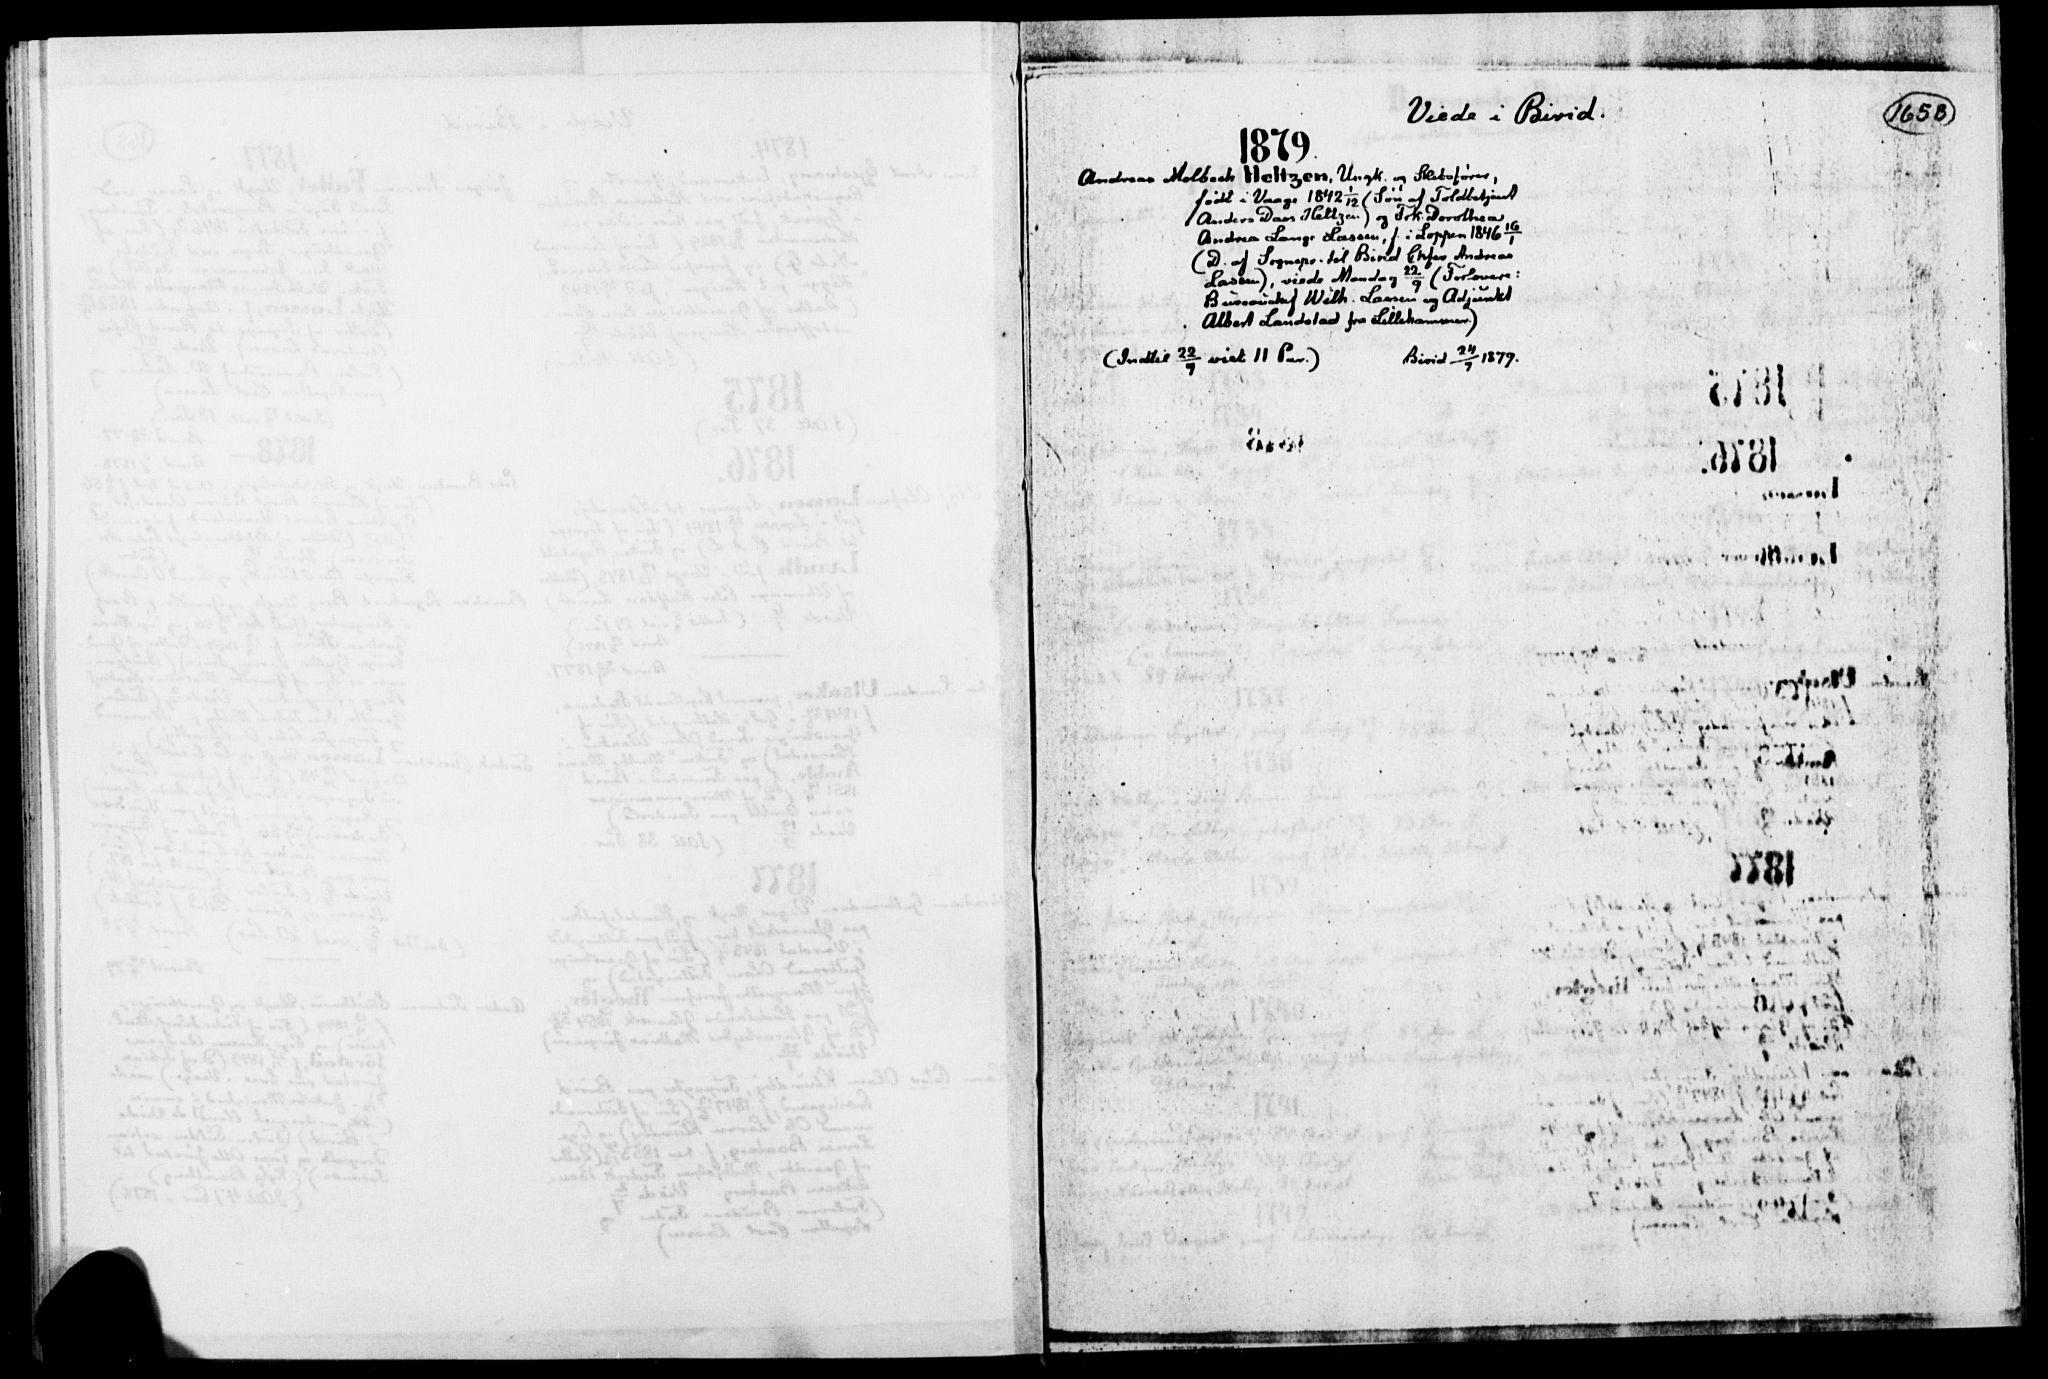 SAH, Biri prestekontor, Ministerialbok, 1730-1879, s. 165b